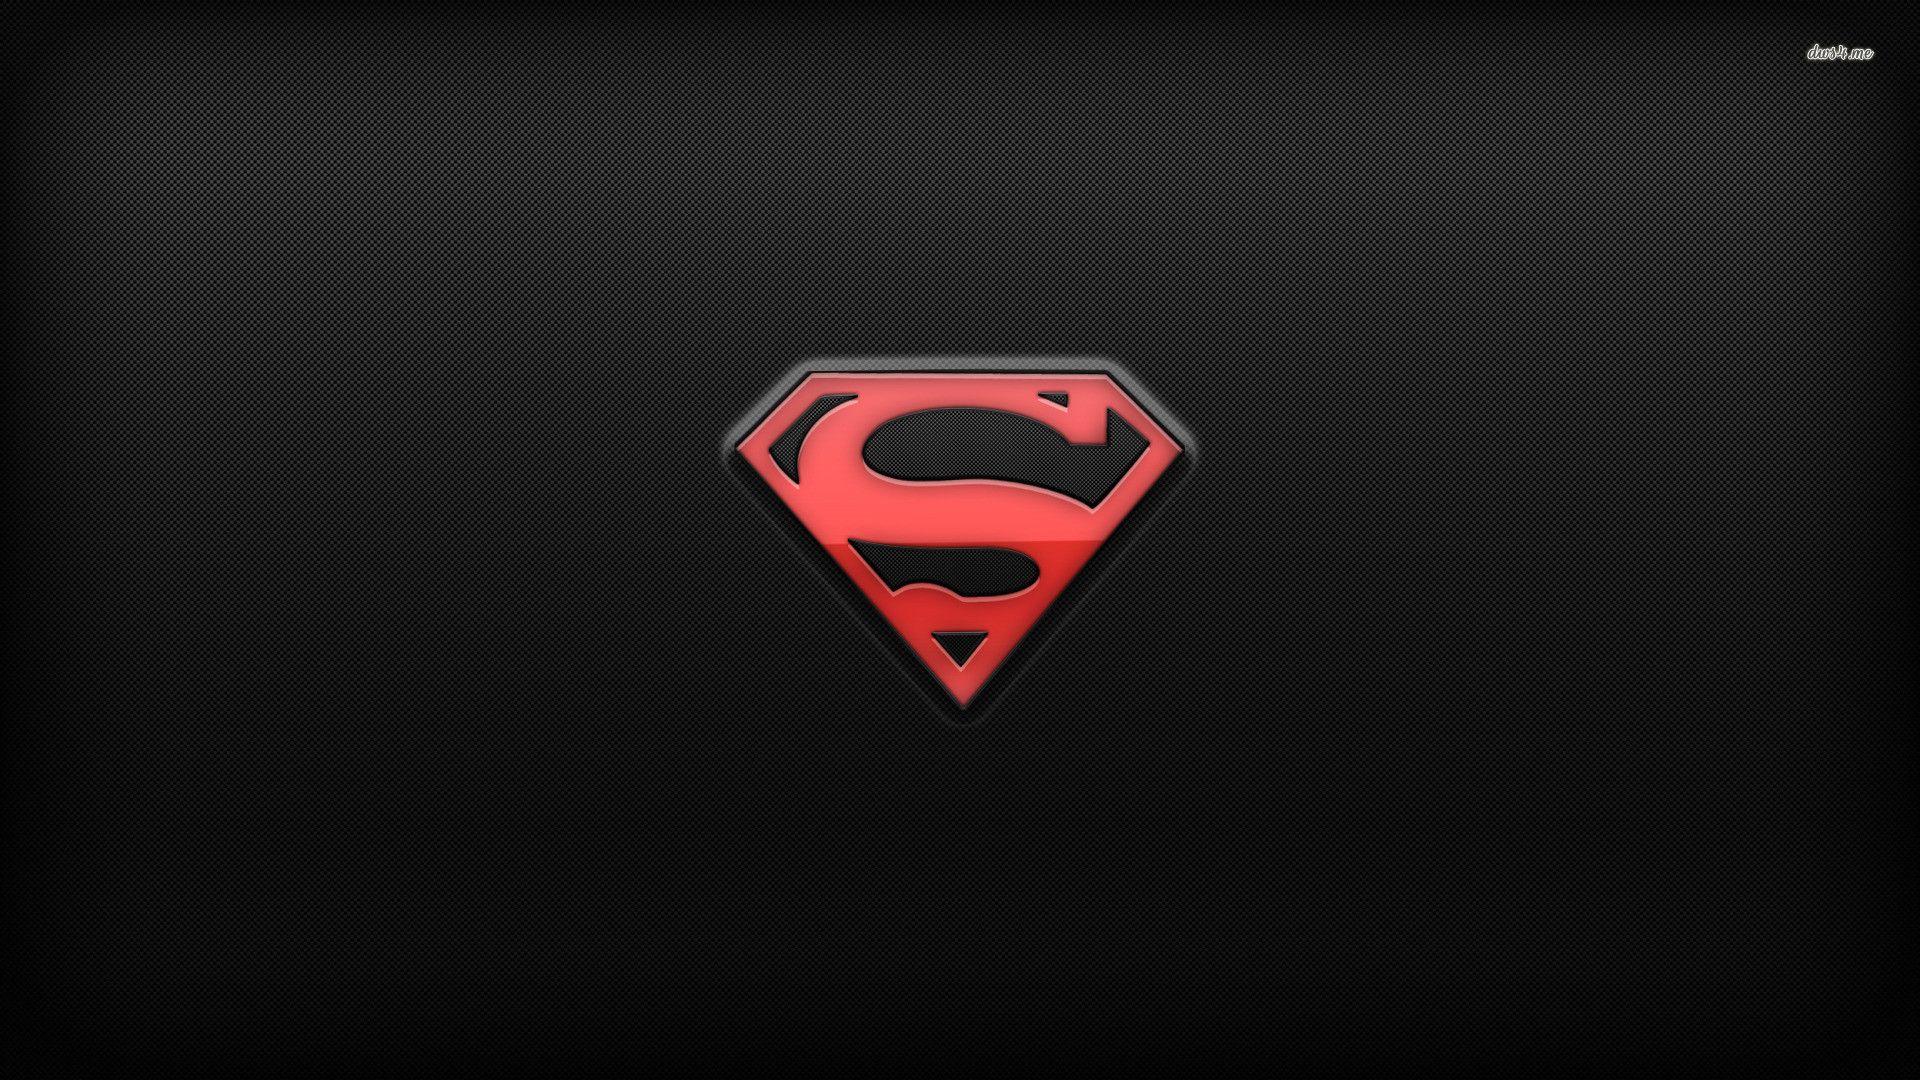 1920x1080 11044 superman logo 1920x1080 movie wallpaper comic book 1920x1080 11044 superman logo 1920x1080 movie wallpaper voltagebd Choice Image